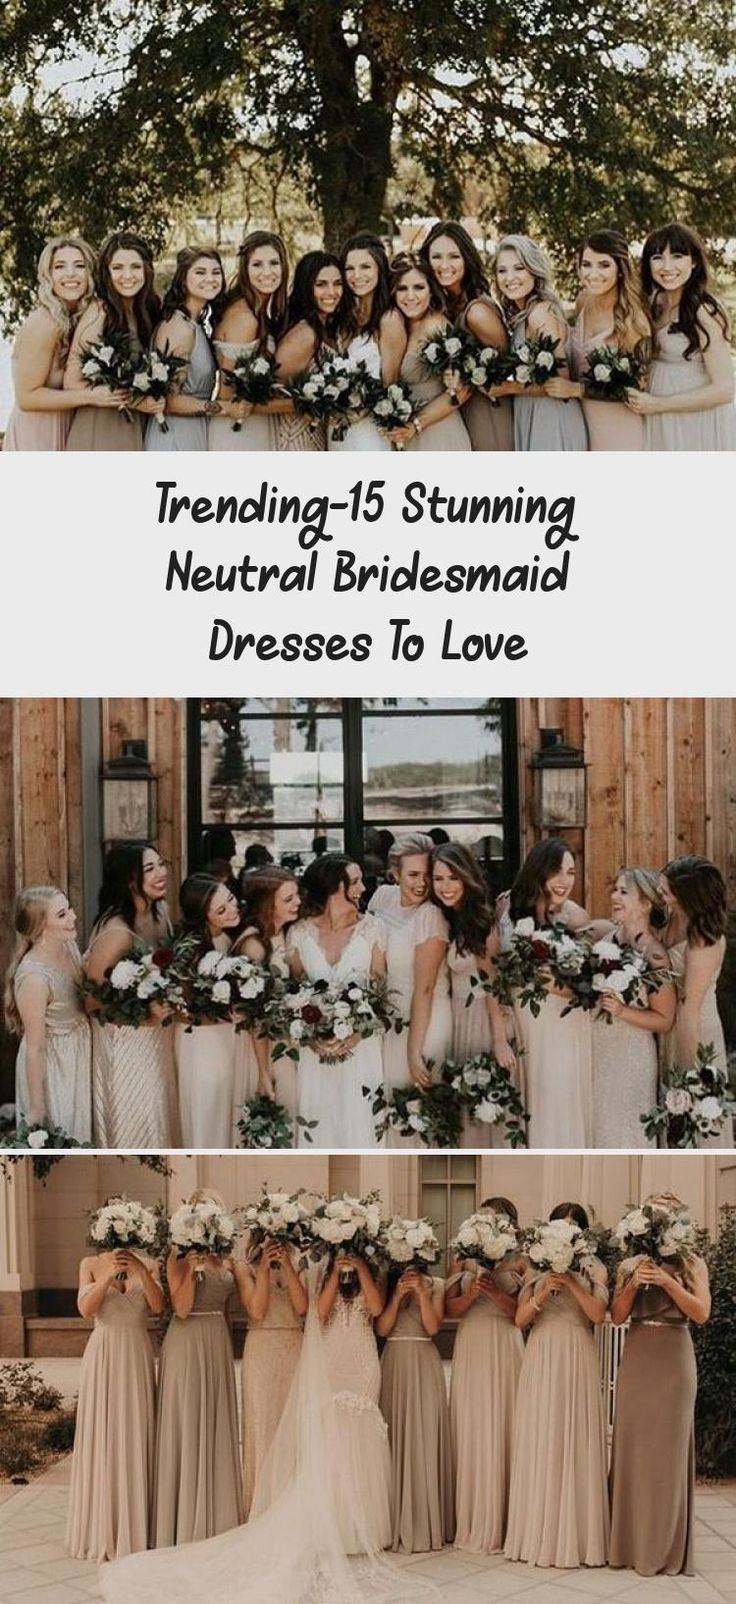 neutral champagne bridesmaid dresses #obde #weddingideas2019 #BridesmaidDressesCountry #BridesmaidDressesFall #MermaidBridesmaidDresses #ElegantBridesmaidDresses #NeutralBridesmaidDresses